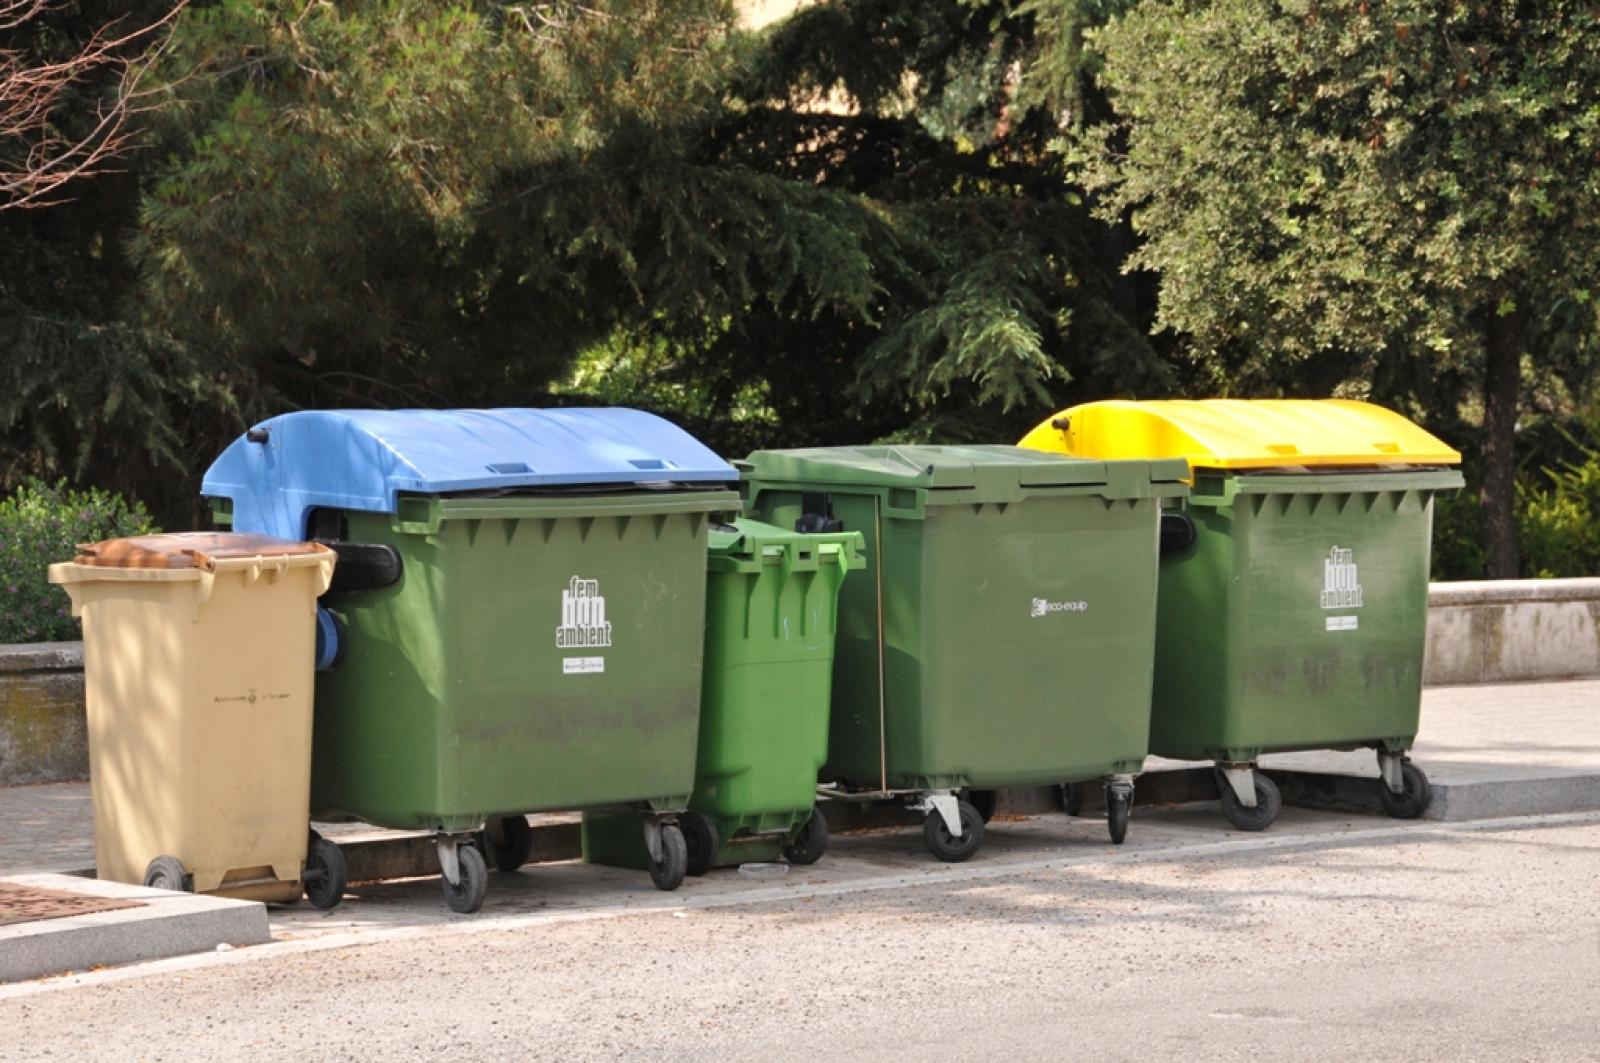 Bateria de contenidors a Terrassa